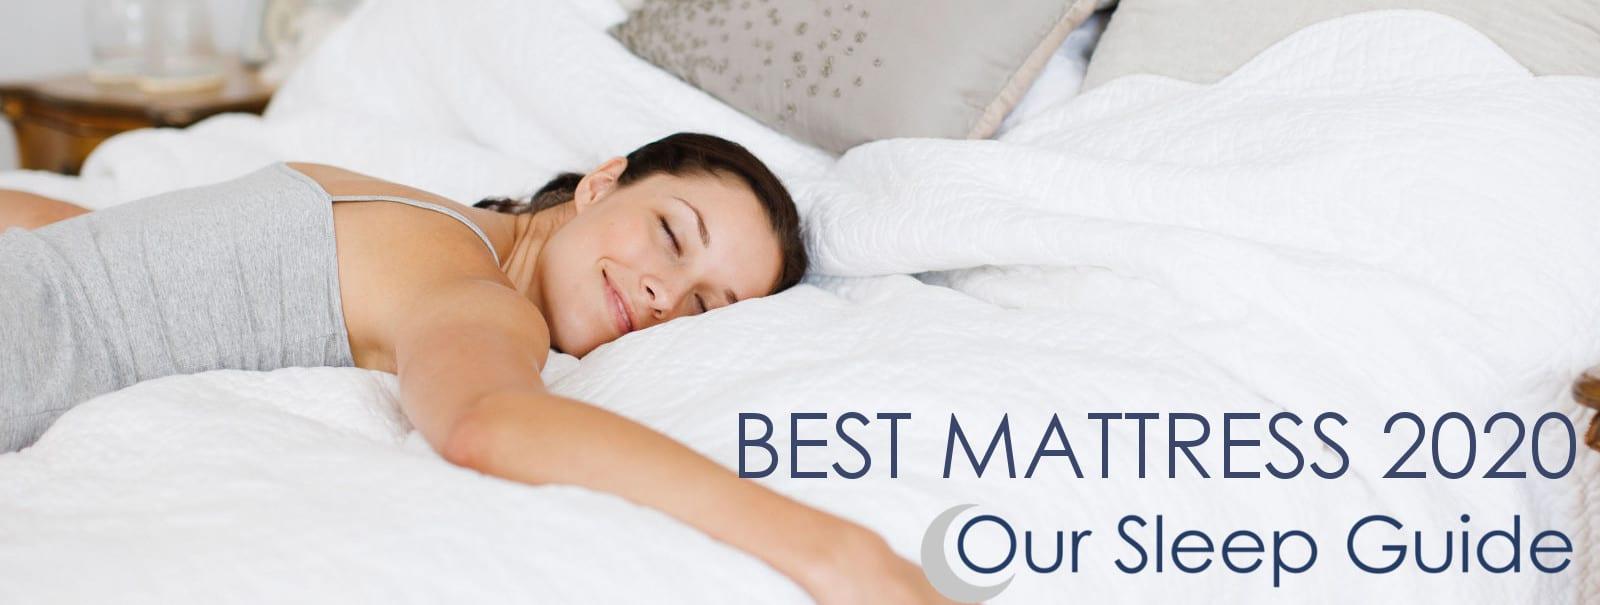 best mattresses 2020